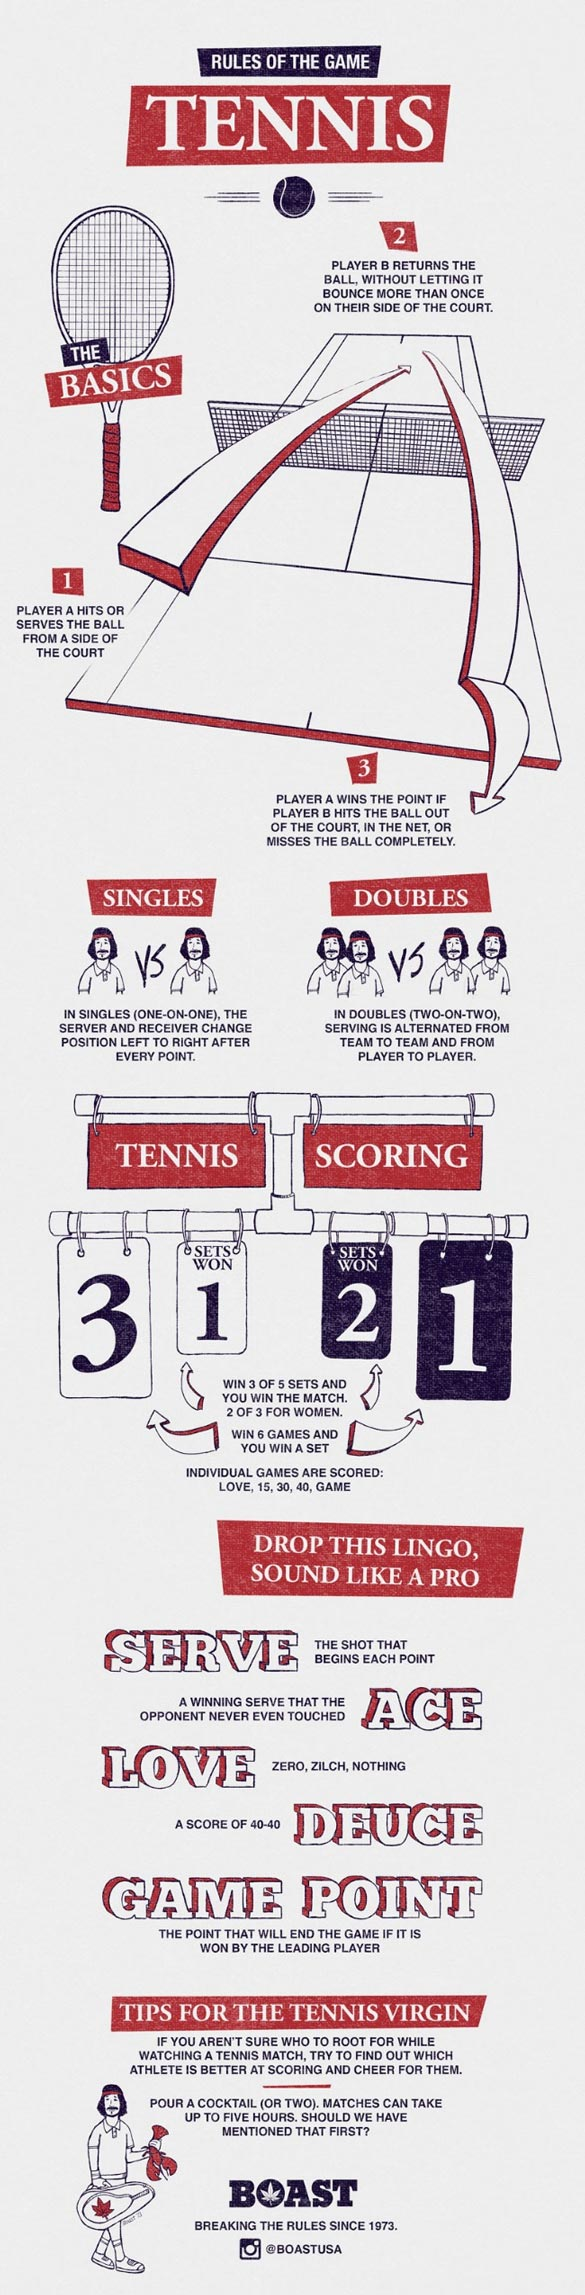 tennis-rules